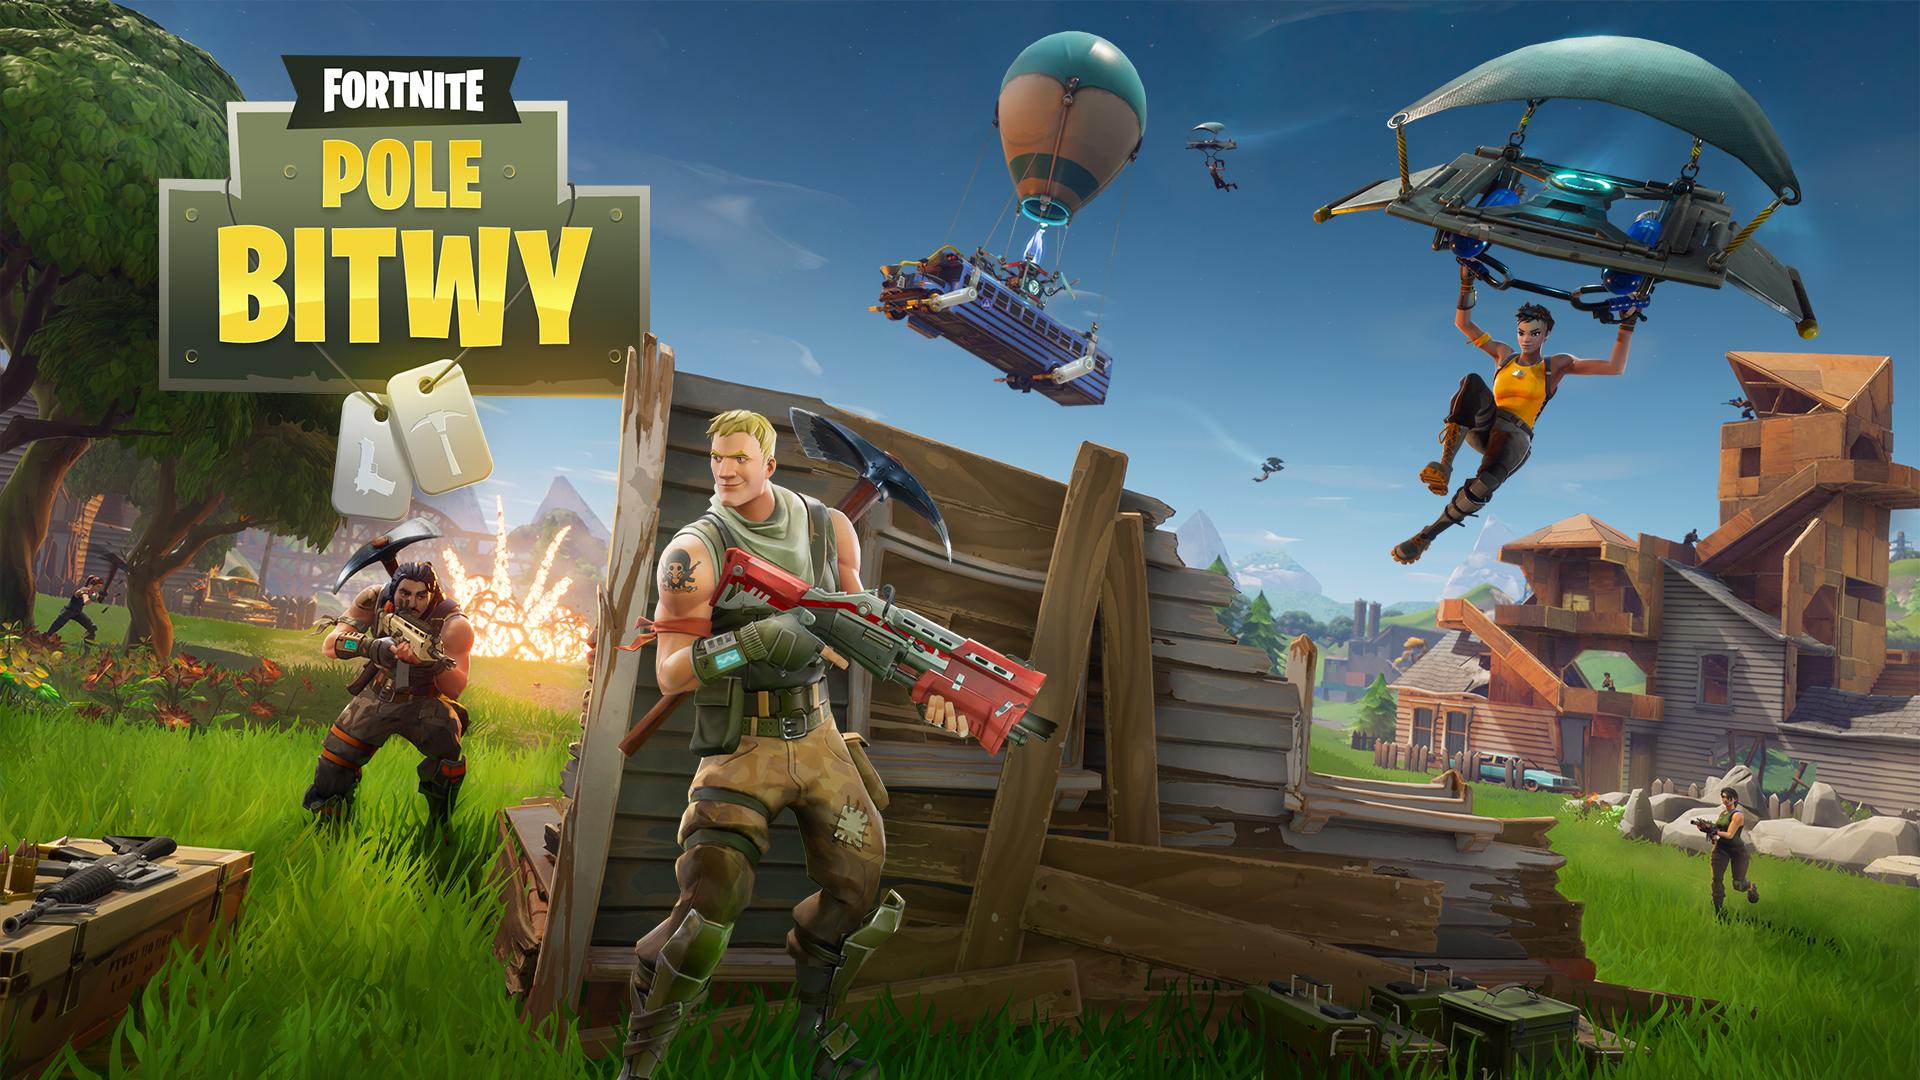 Battle Royale w Fortnite (PS4, Xbox One, PC i MAC) za darmo !